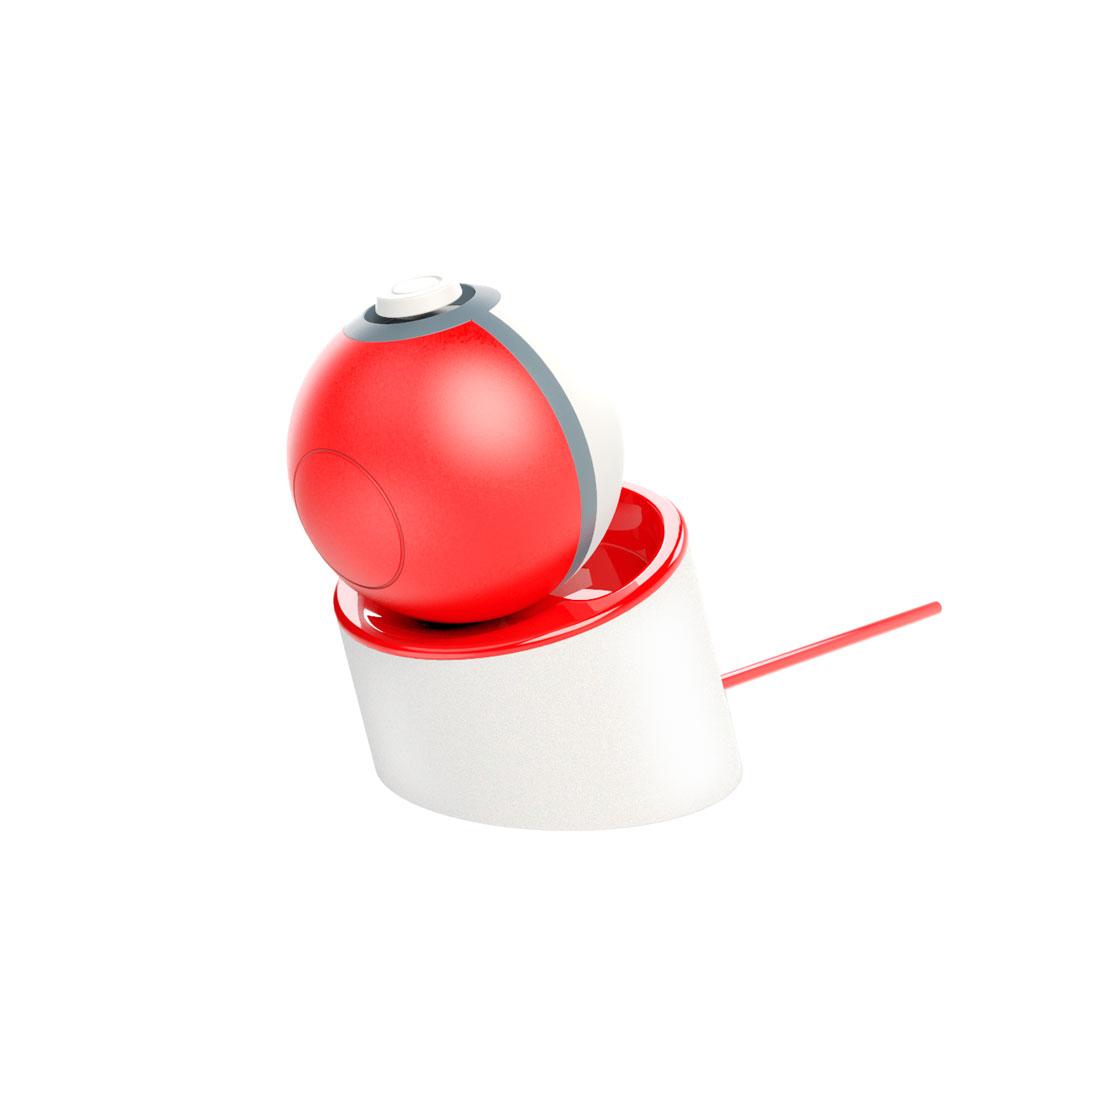 pokeball-charger-w-ball-angle-right-1100x1100